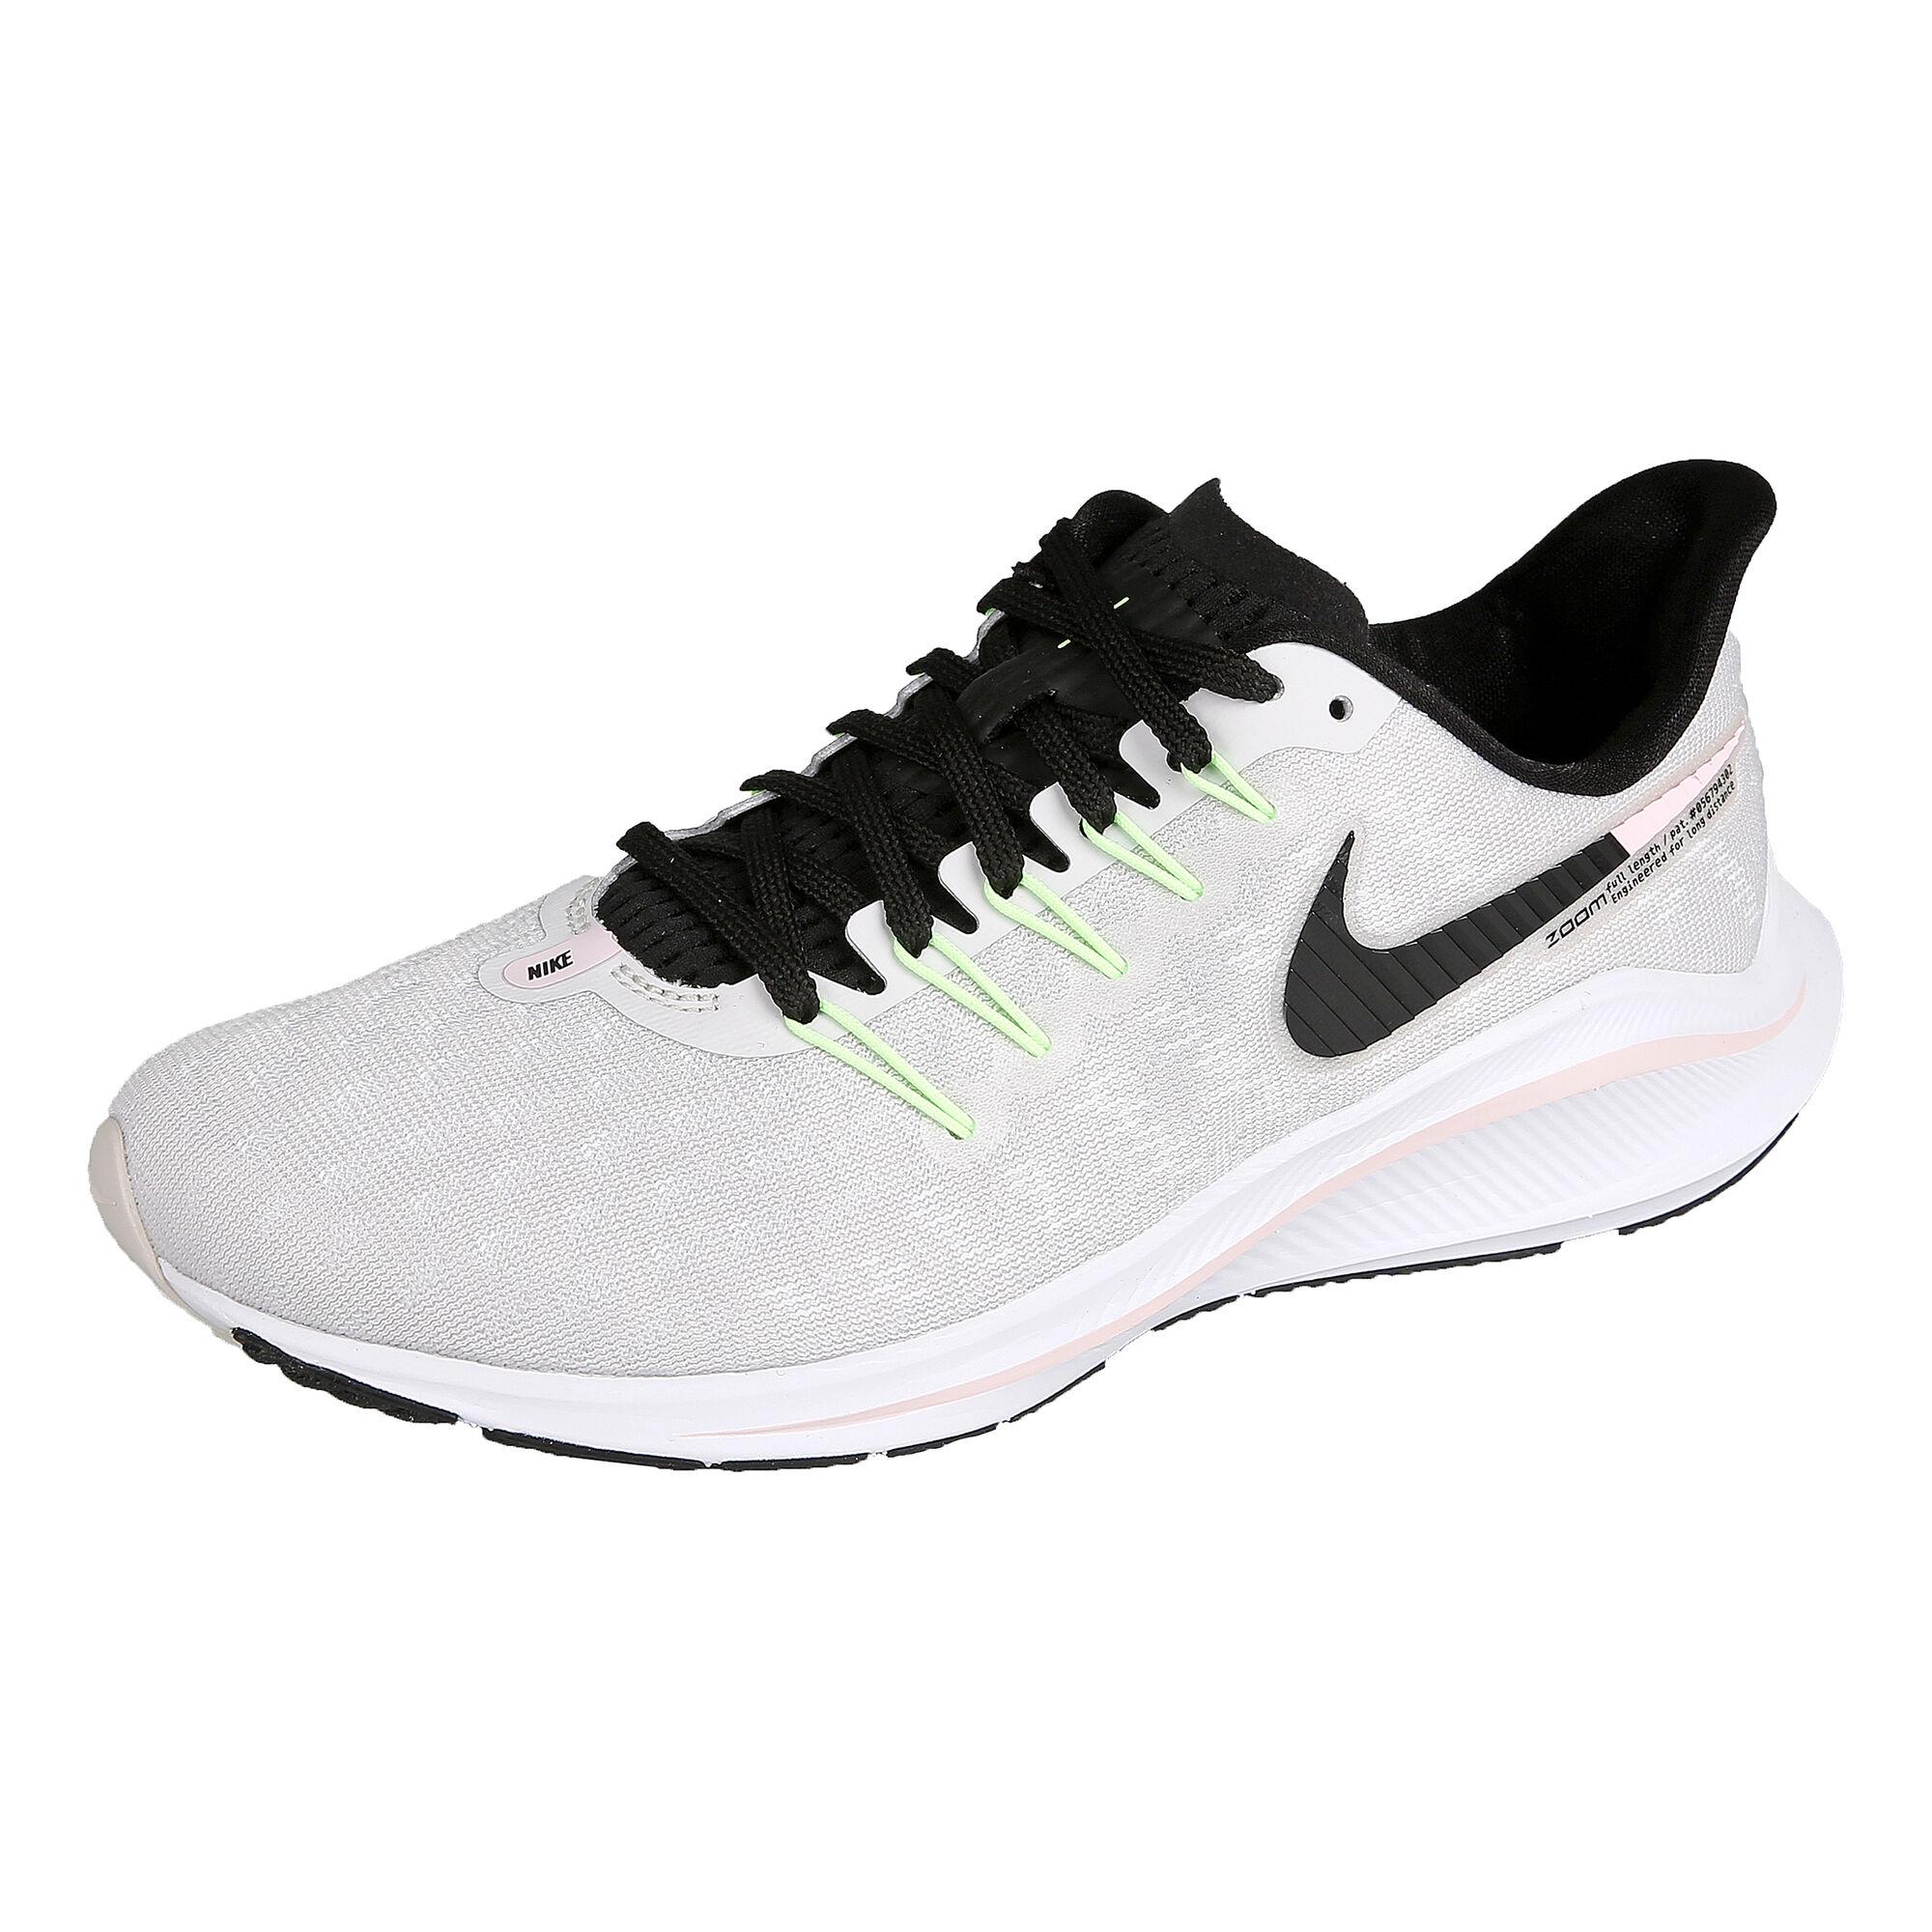 4b8d16ce5989f Nike · Nike · Nike · Nike · Nike · Nike · Nike · Nike · Nike · Nike. Air  Zoom Vomero 14 Women ...